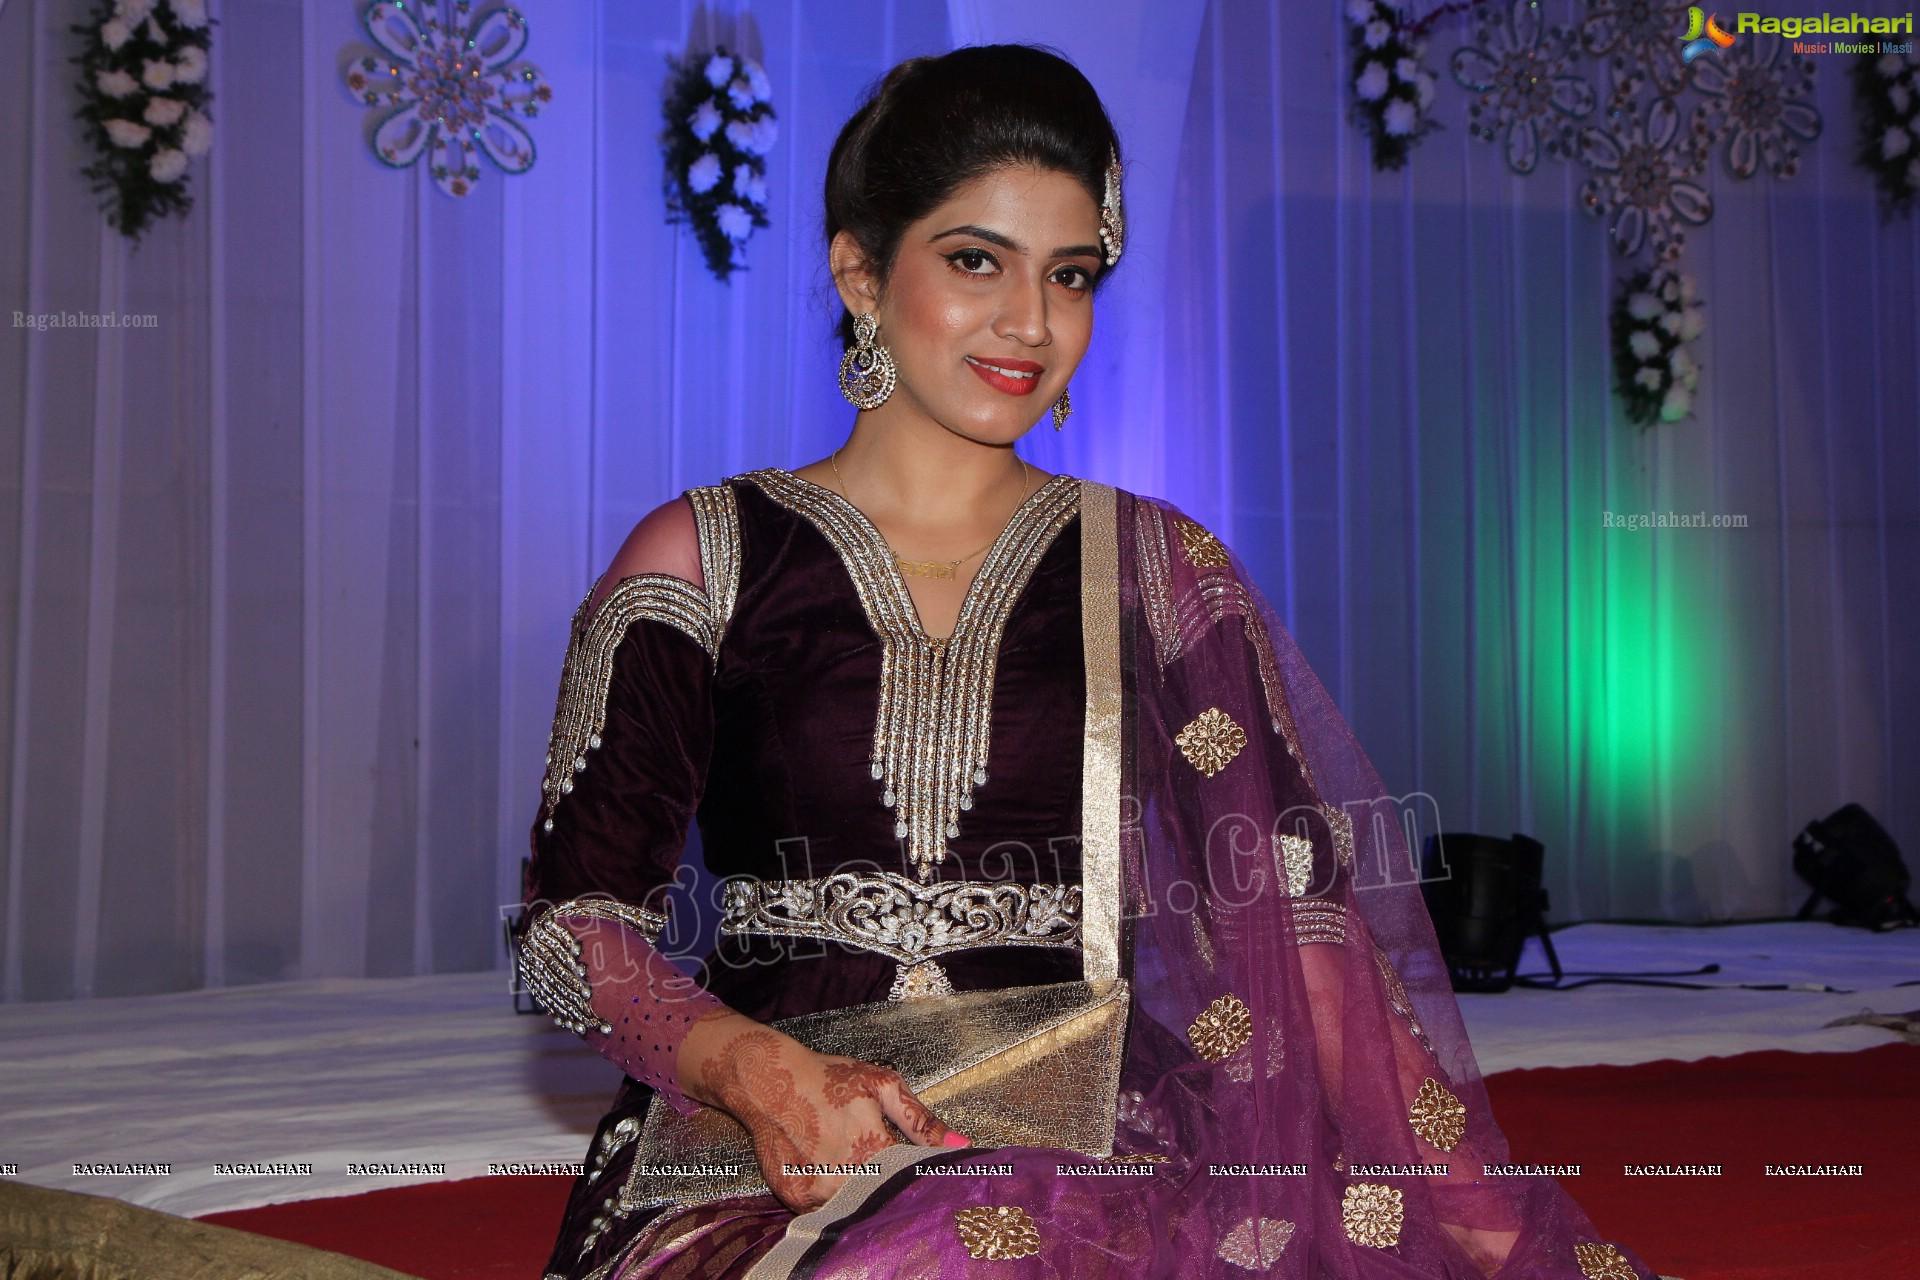 Grand Wedding Of Sana S Daughter Tabasum